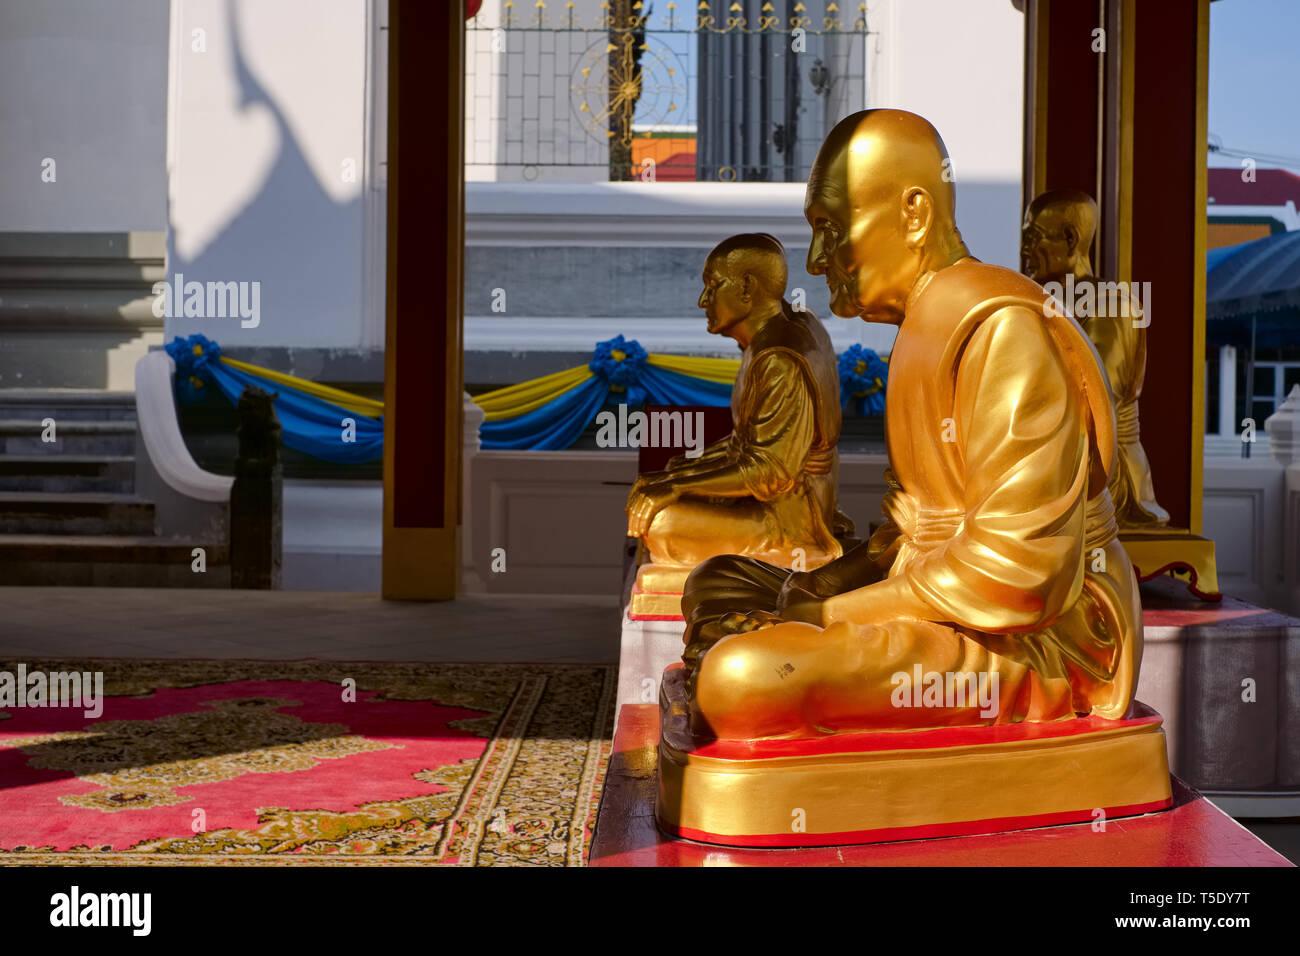 Figures of revered Buddhist monks  at Wat Kalayanimit, by the Chao Phraya River, Thonburi, Bangkok, Thailand - Stock Image